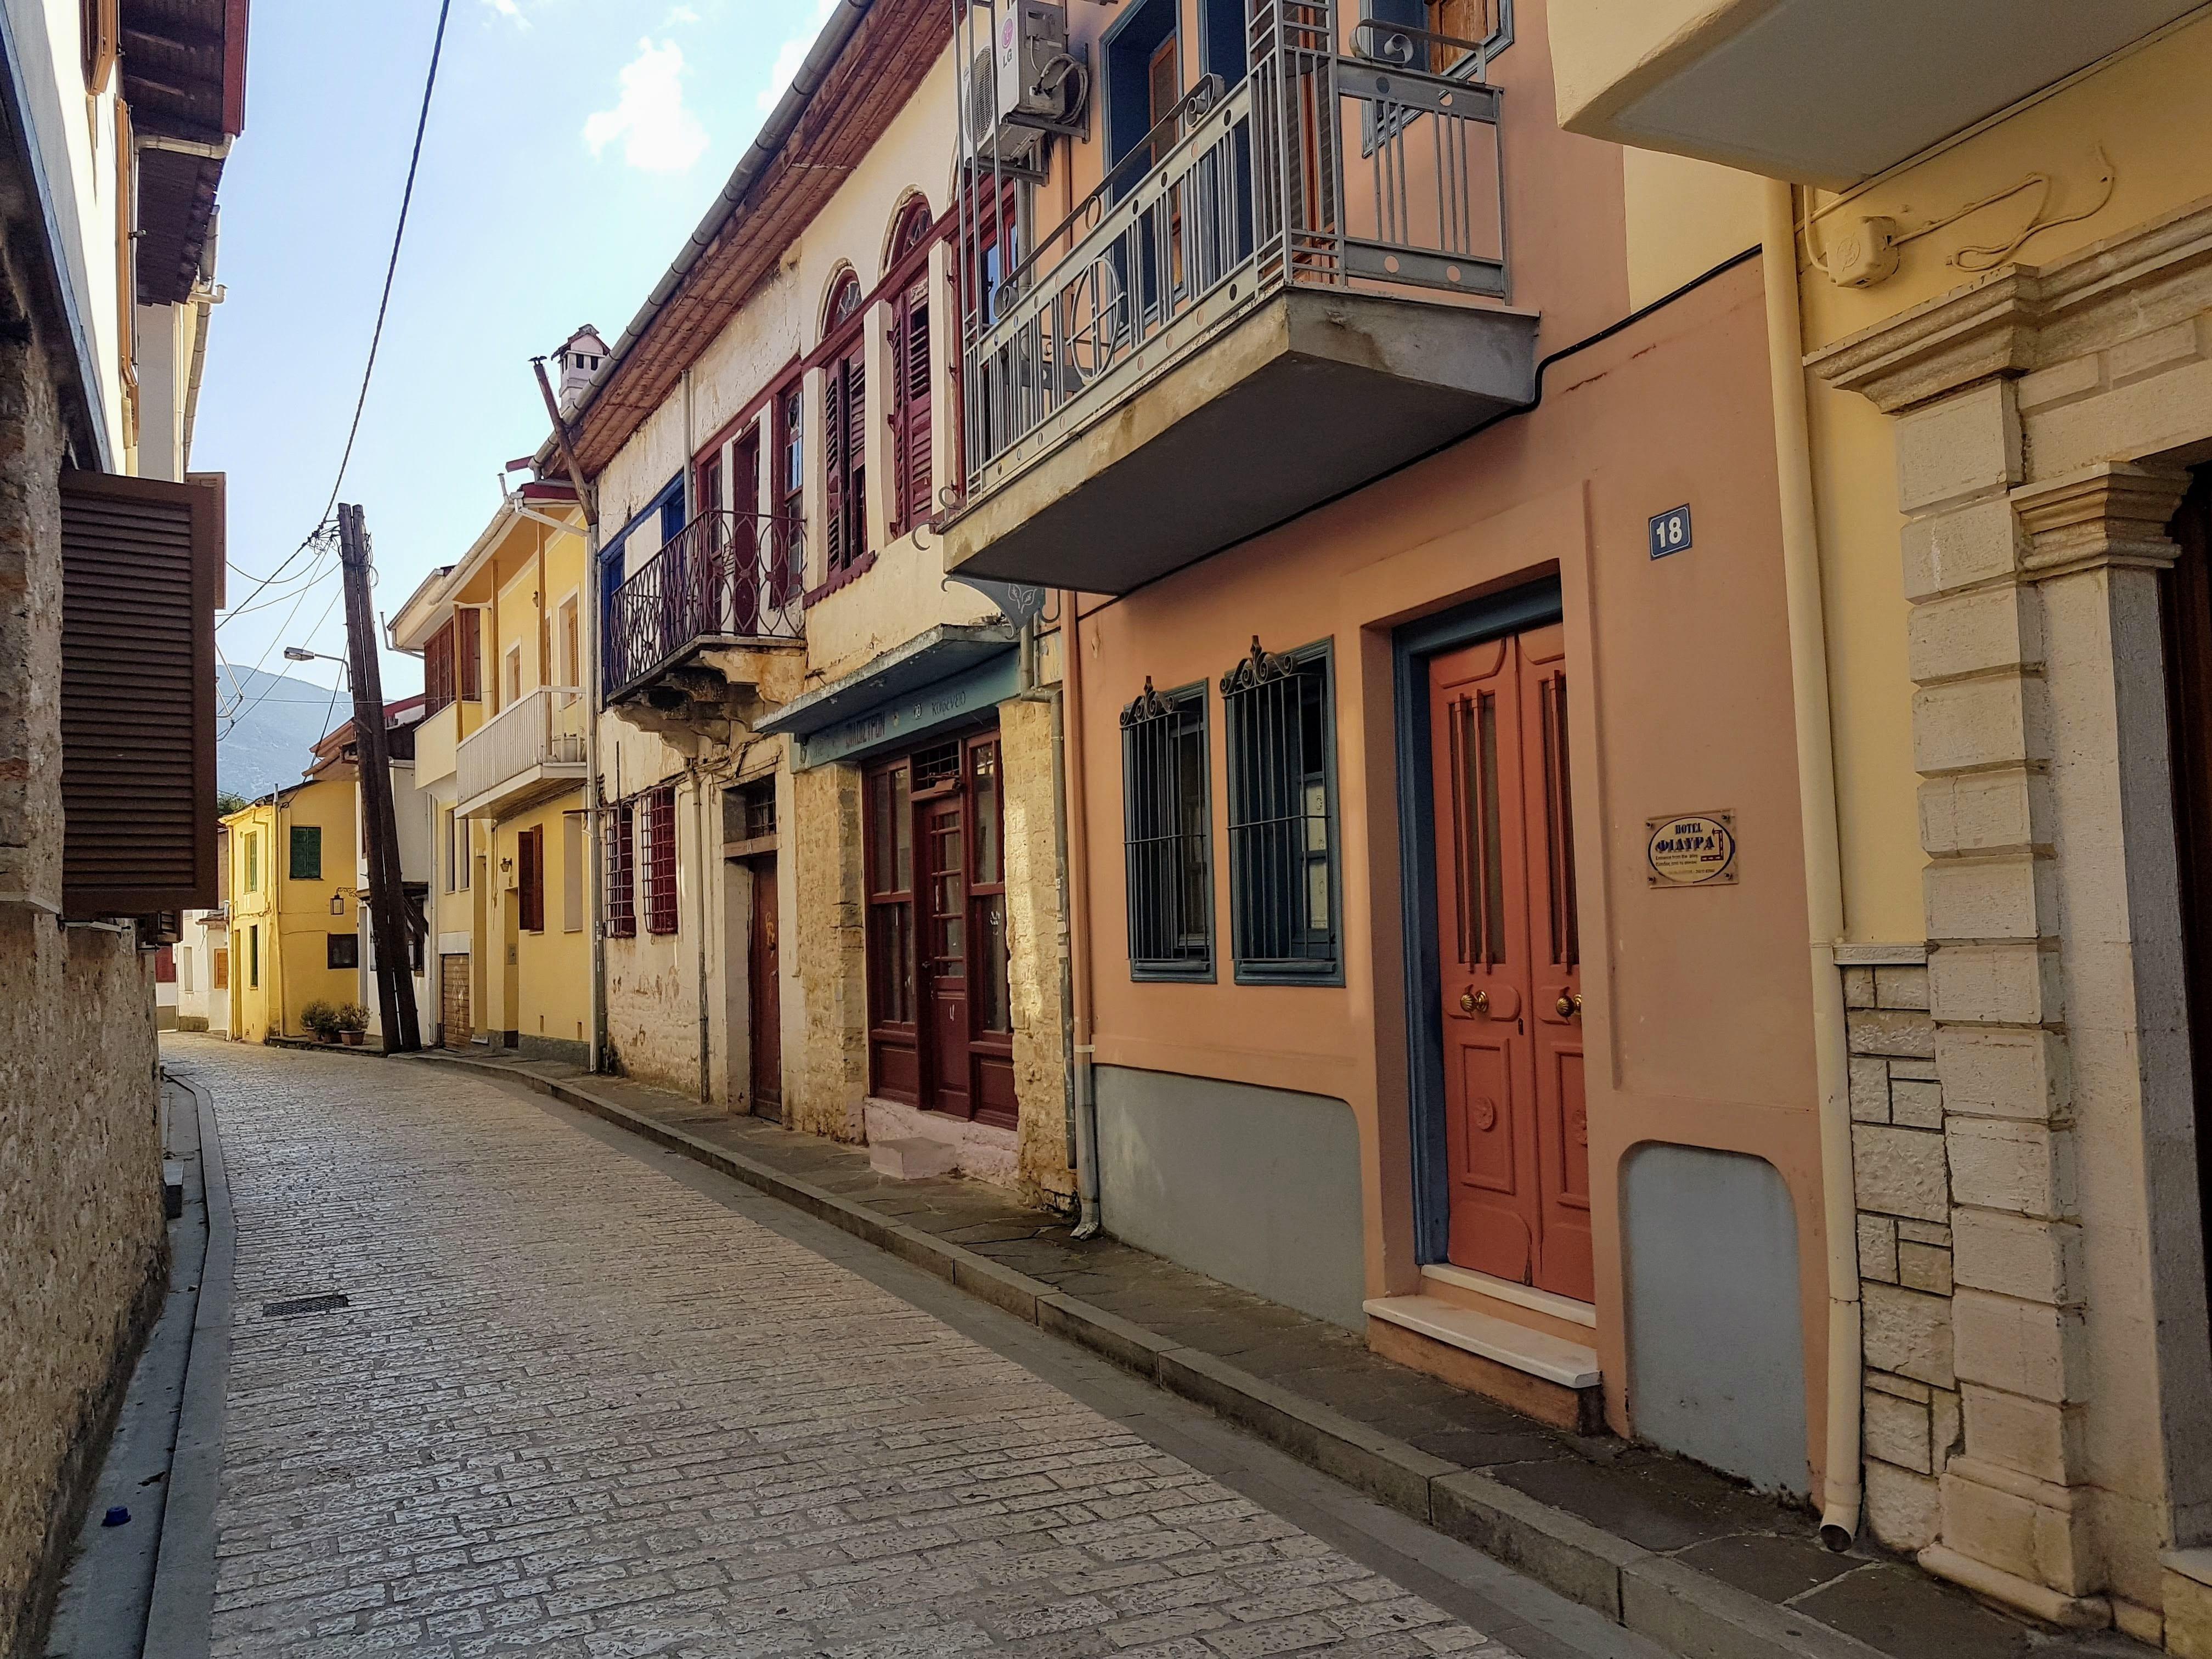 Ioannina in Greece